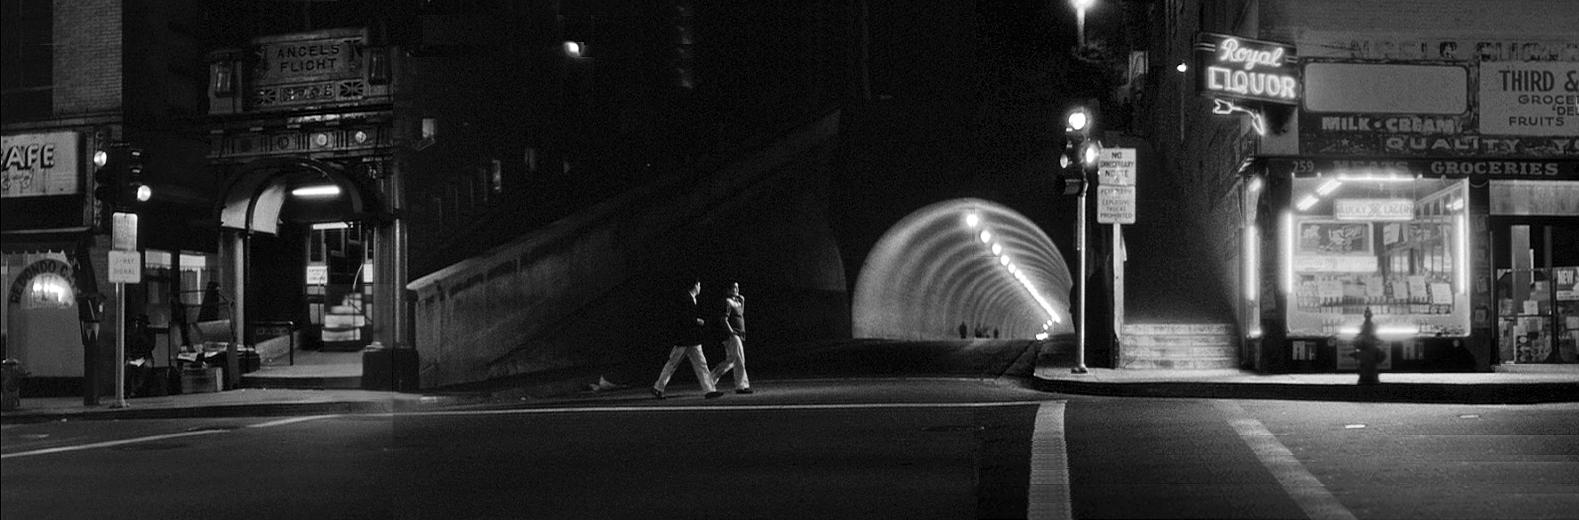 8 - tunnel 2.jpg